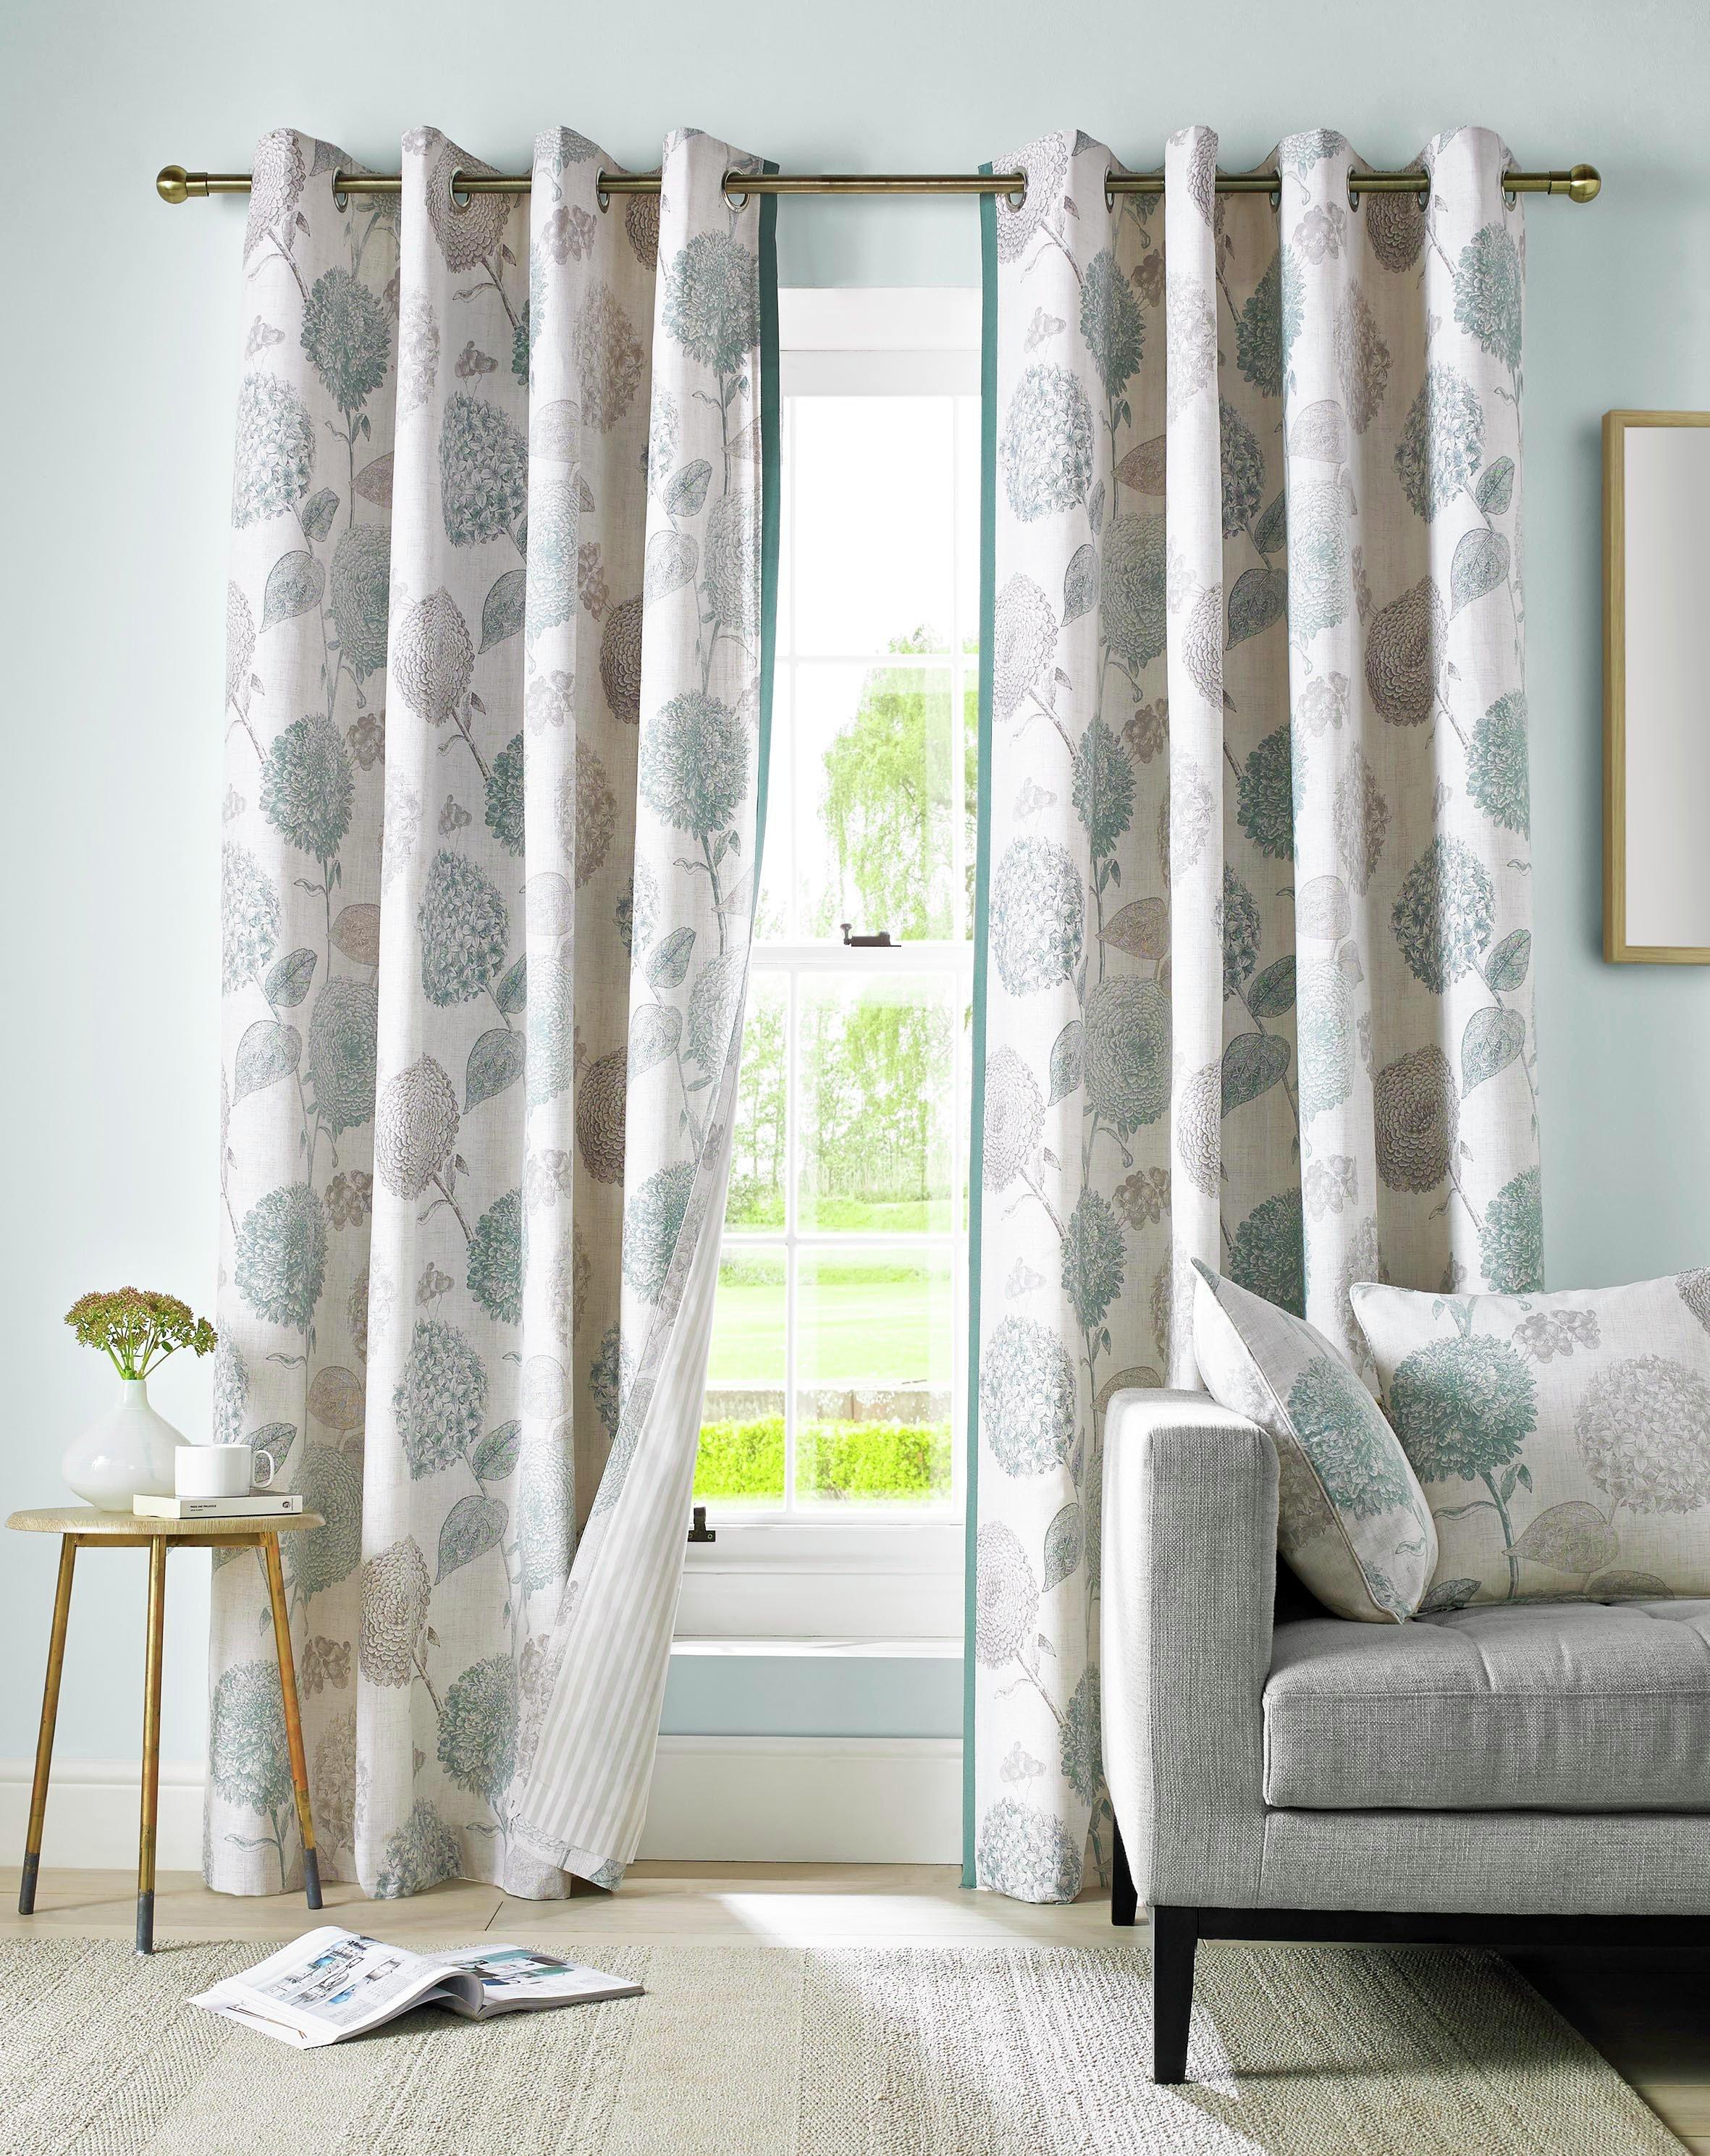 ashley-wilde-avril-eyelet-curtains-229x229cm-duck-egg